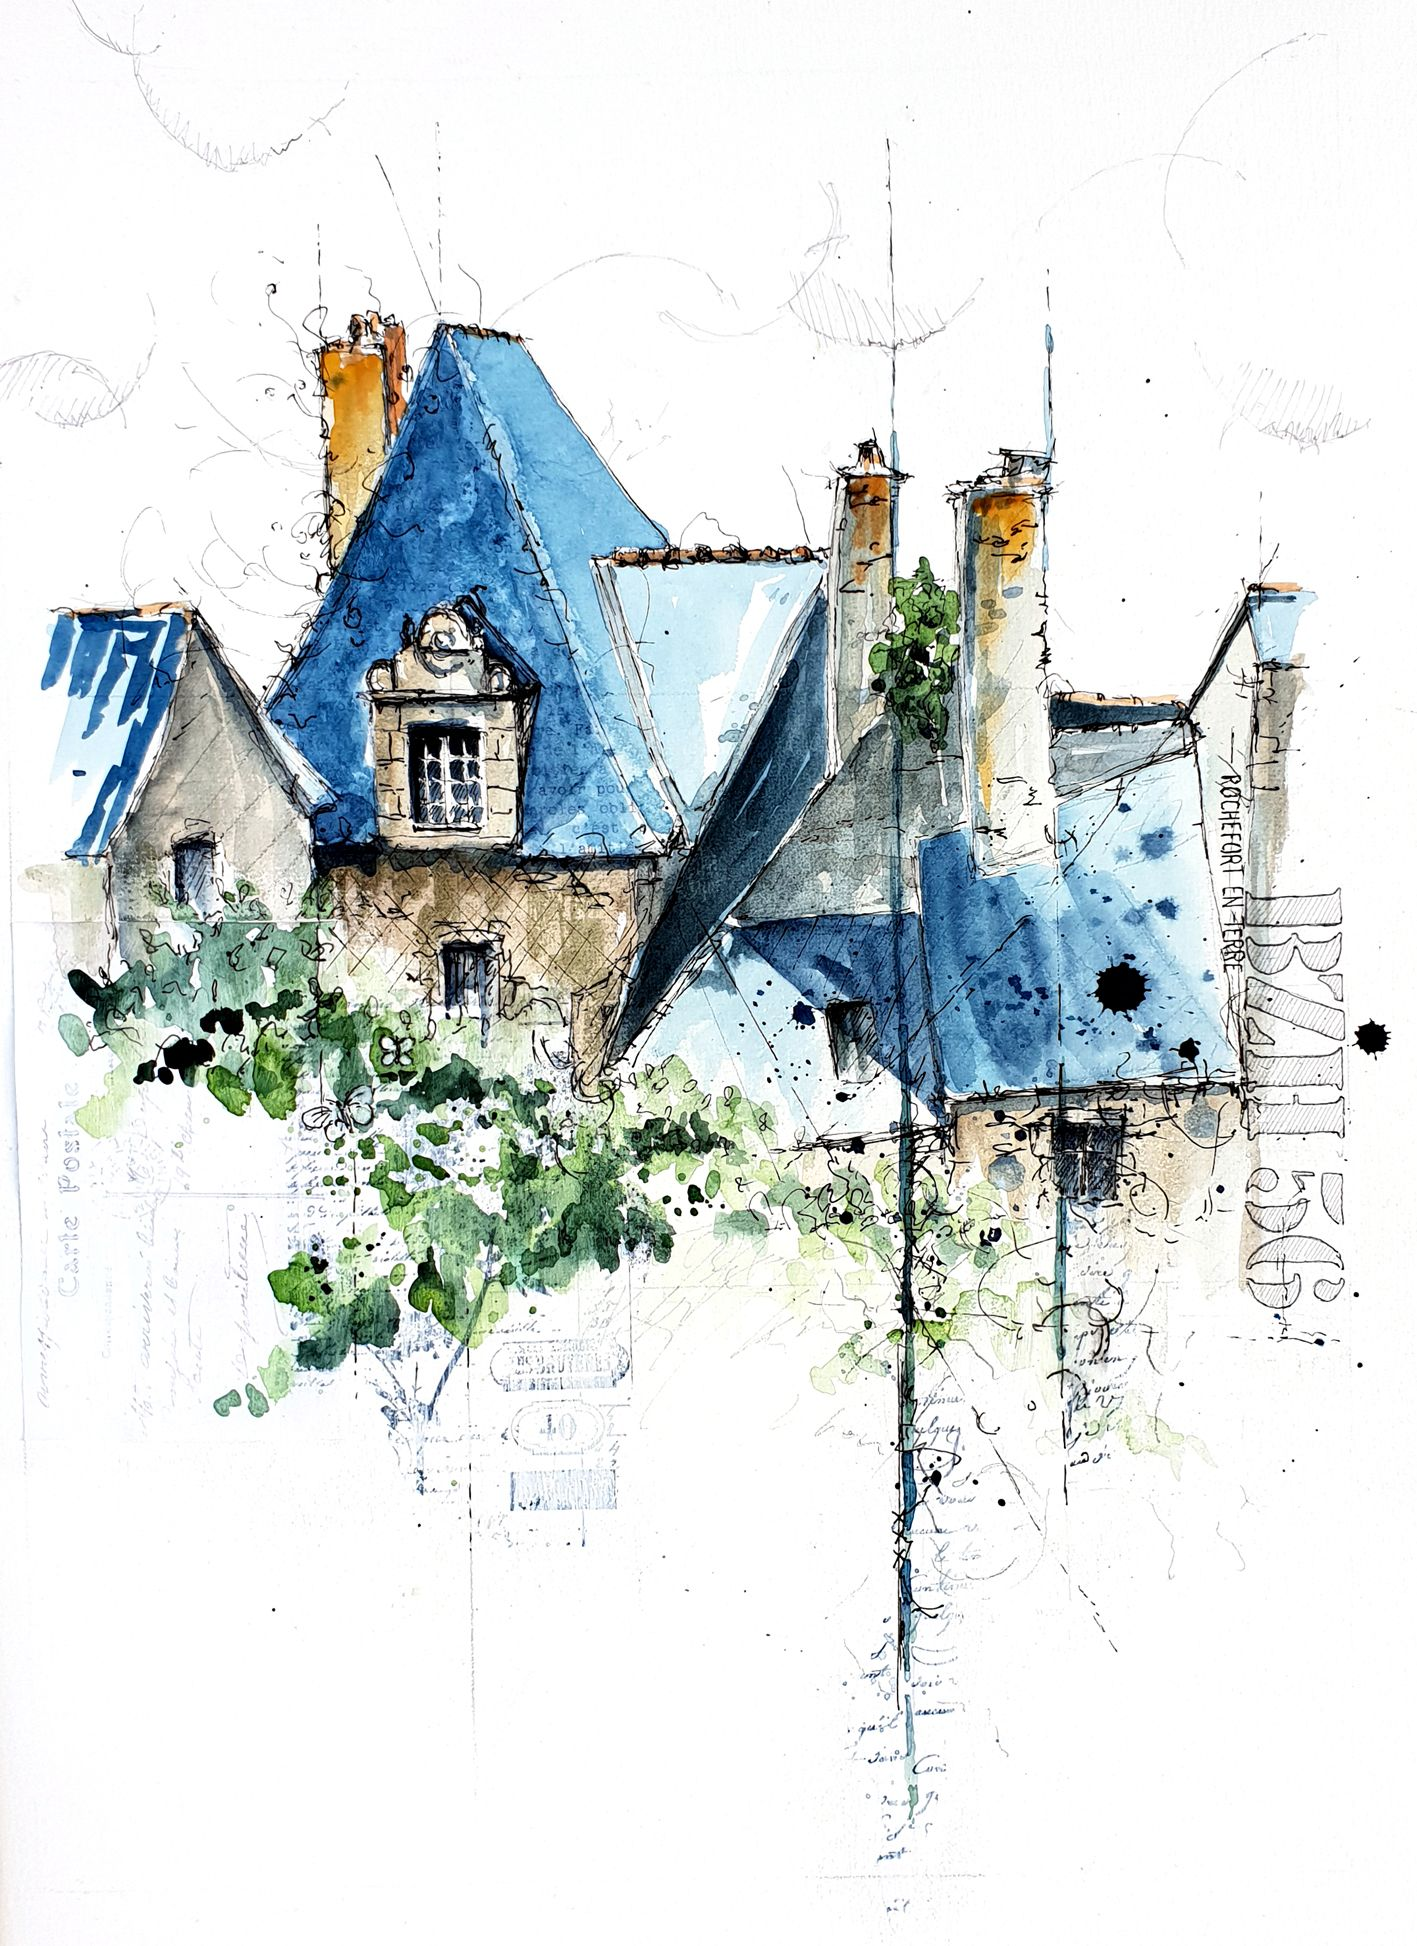 Rochefort En Terre Dessin Aquarelle Village Prefere Des